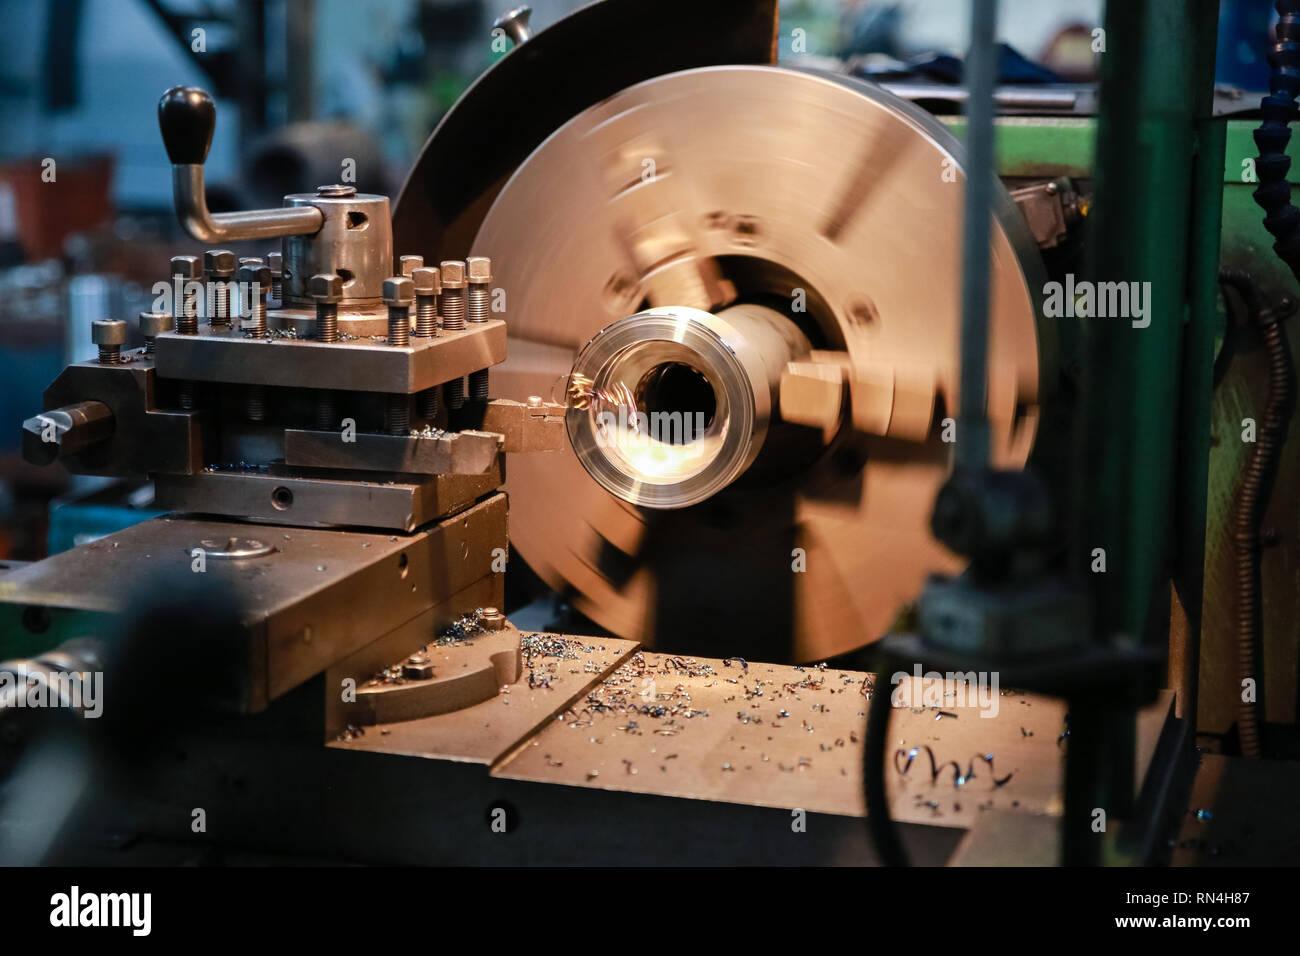 CNC lathe processes metal detail. Automated production. Stock Photo